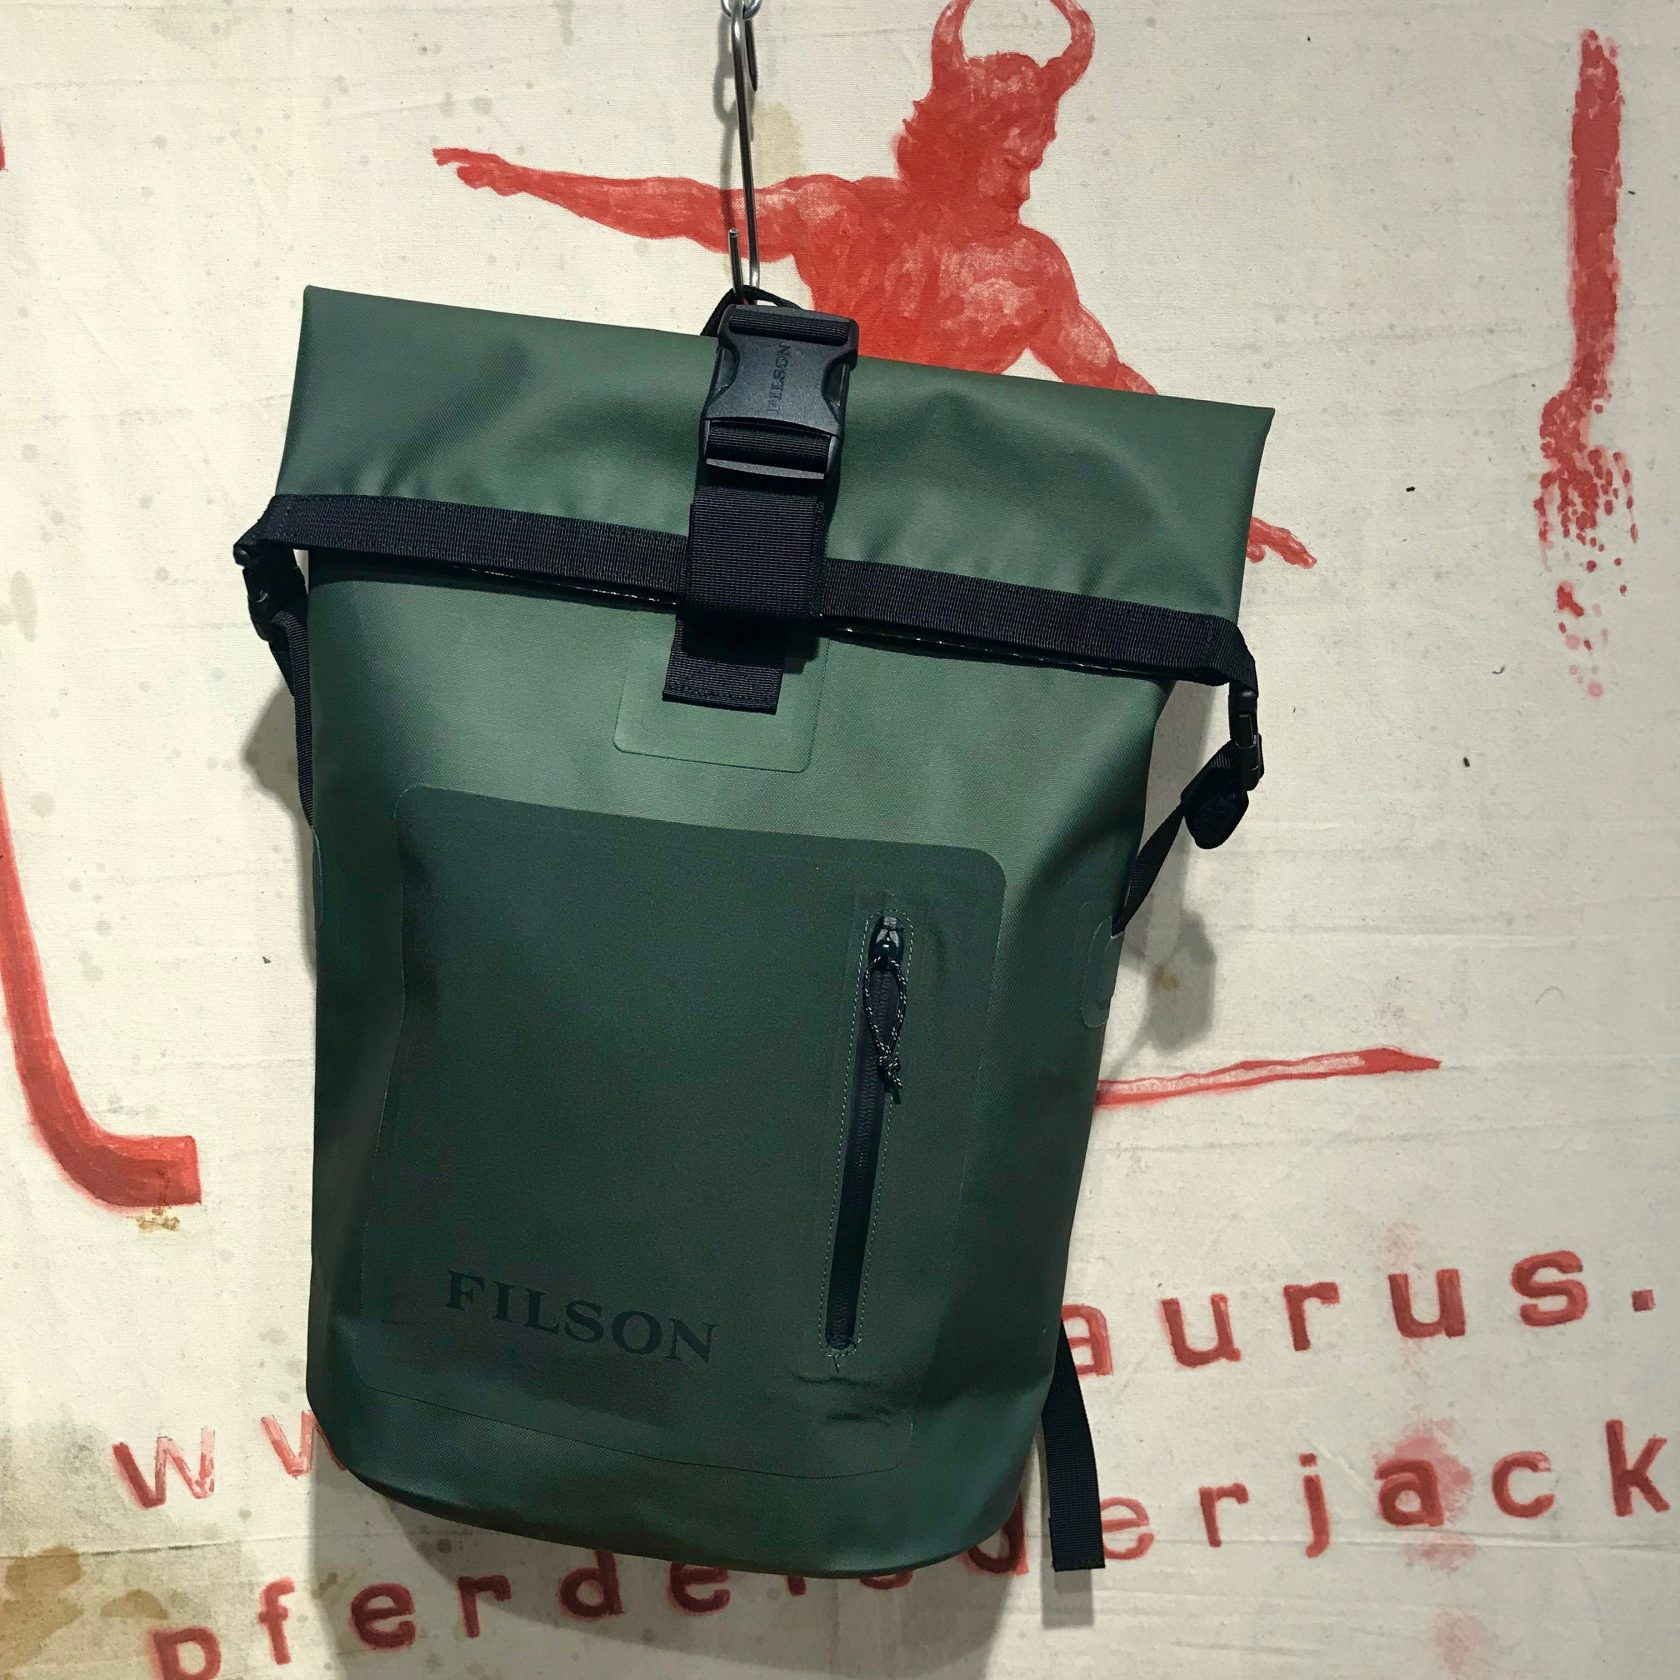 Wilson dry backpack